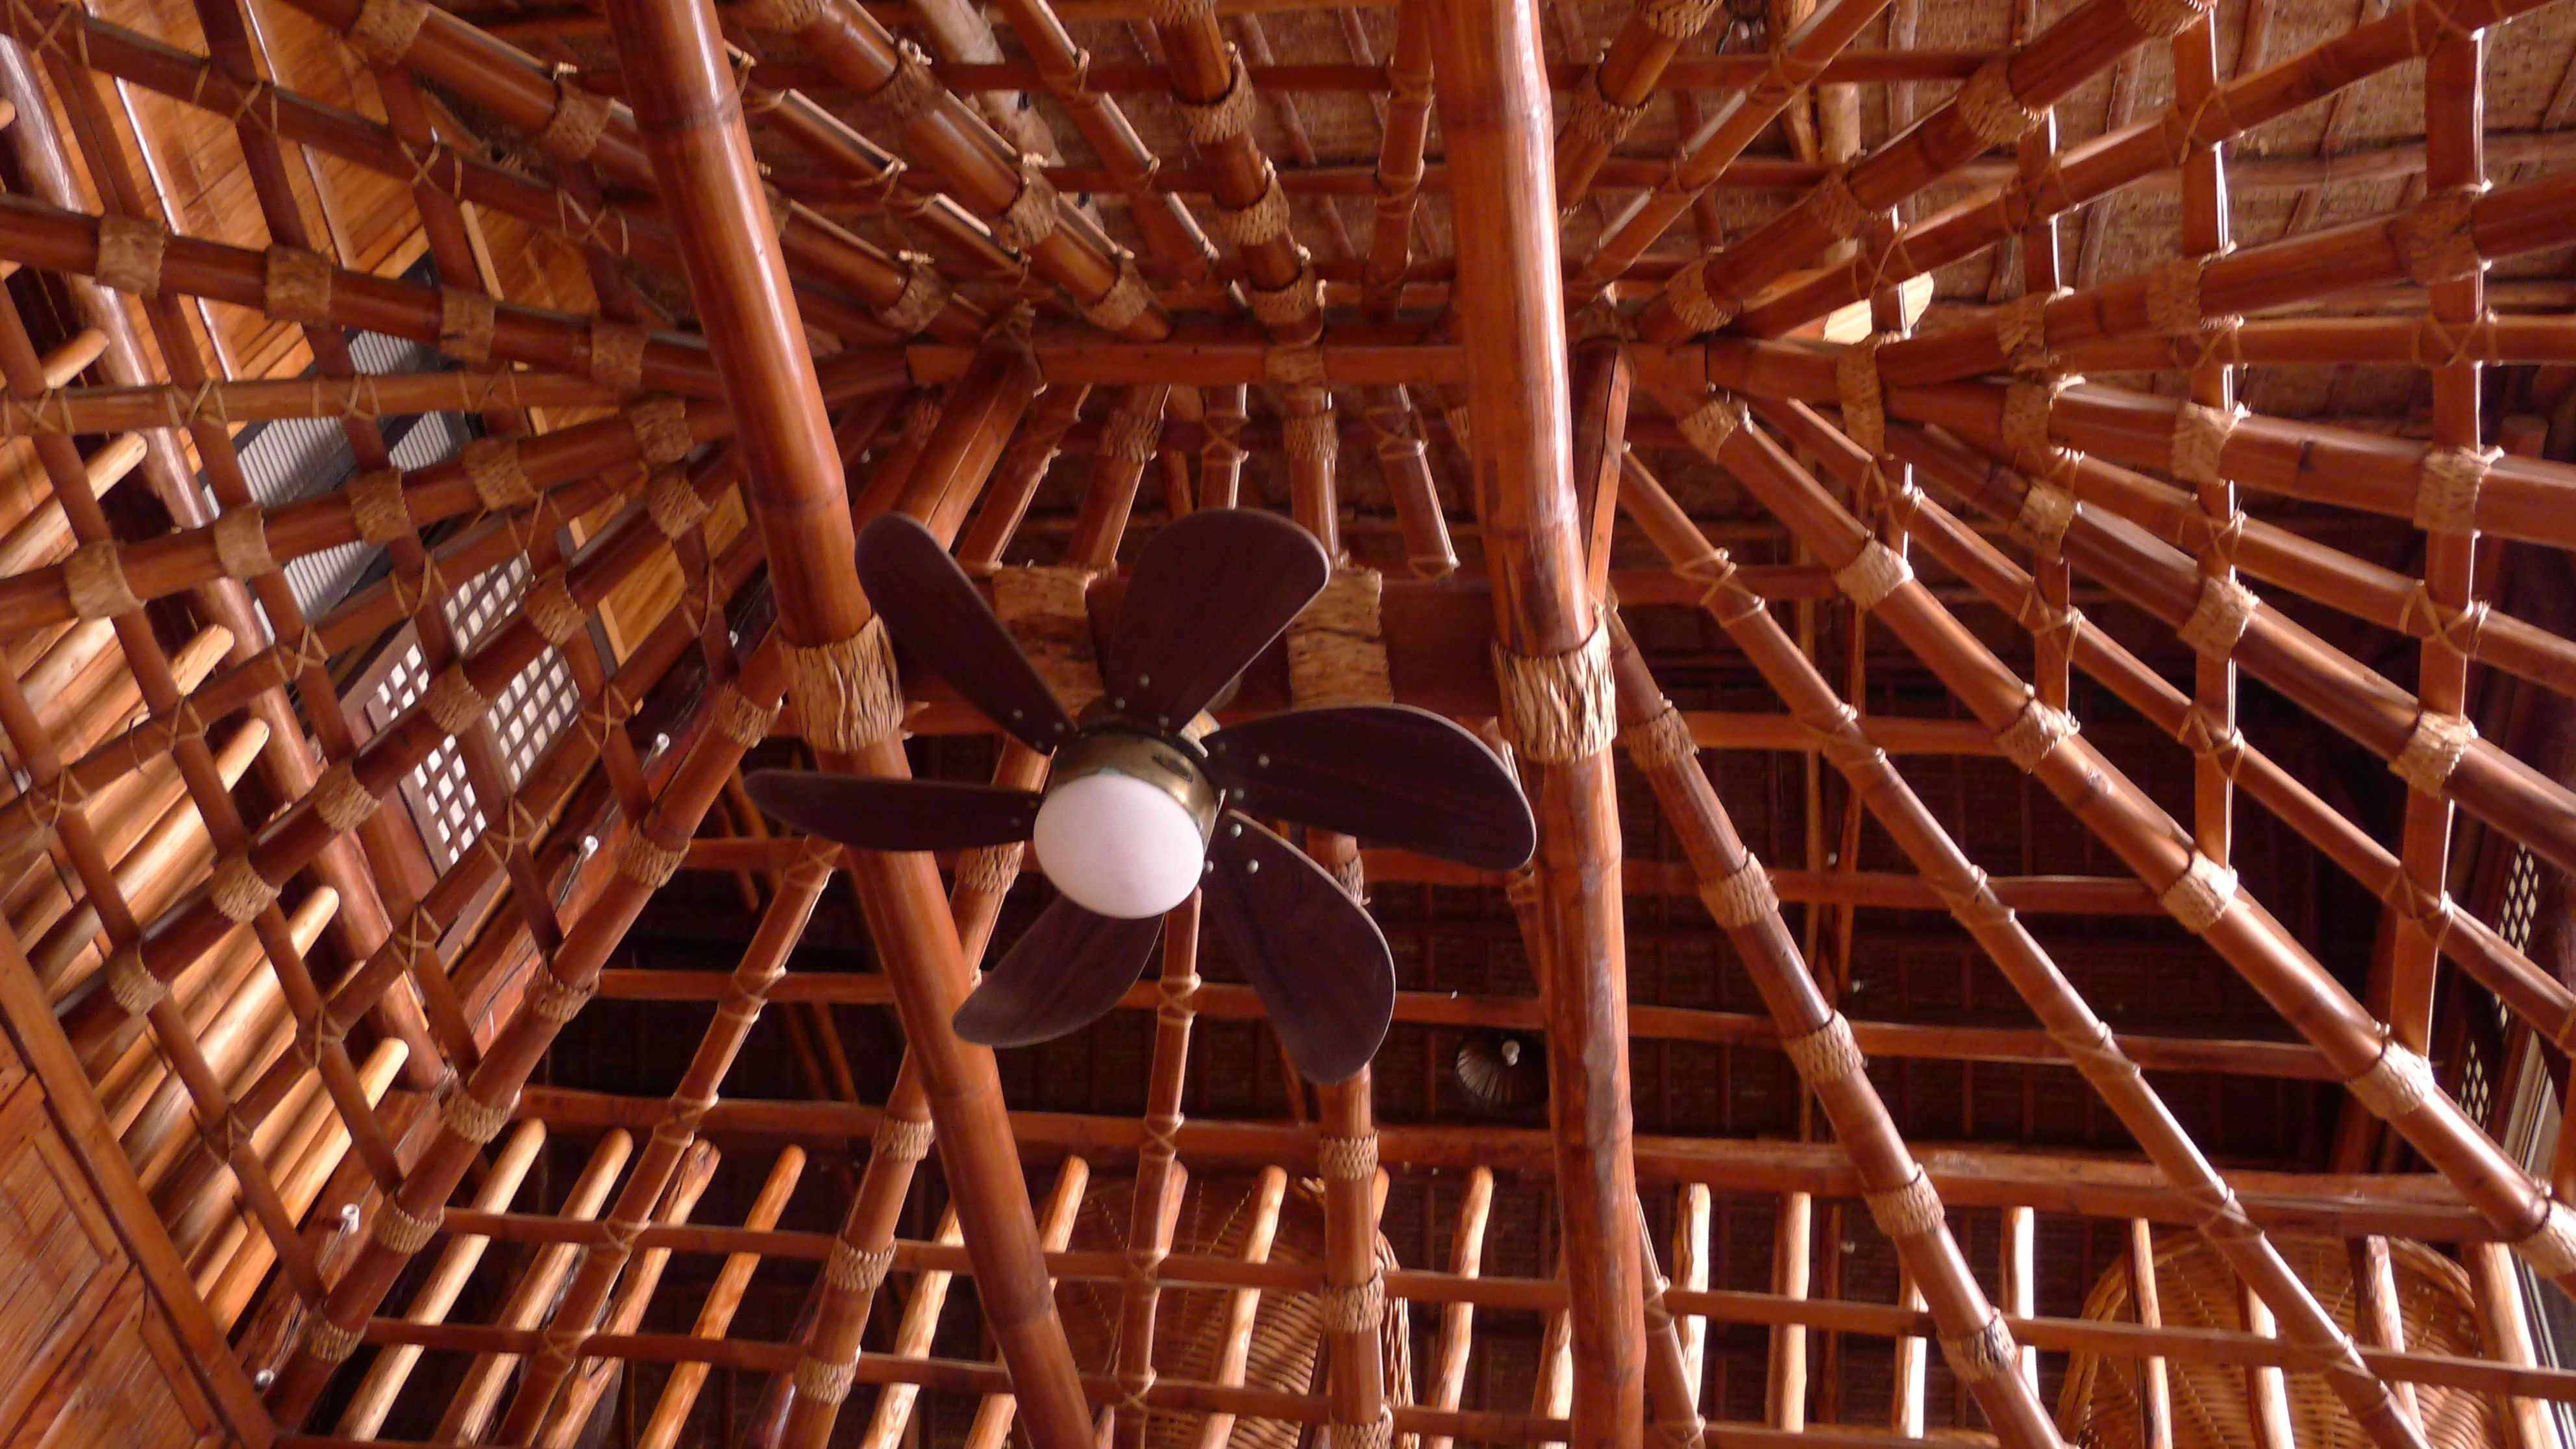 Filipino Style Roofs Philippine Architecture Filipino Architecture Bamboo Architecture